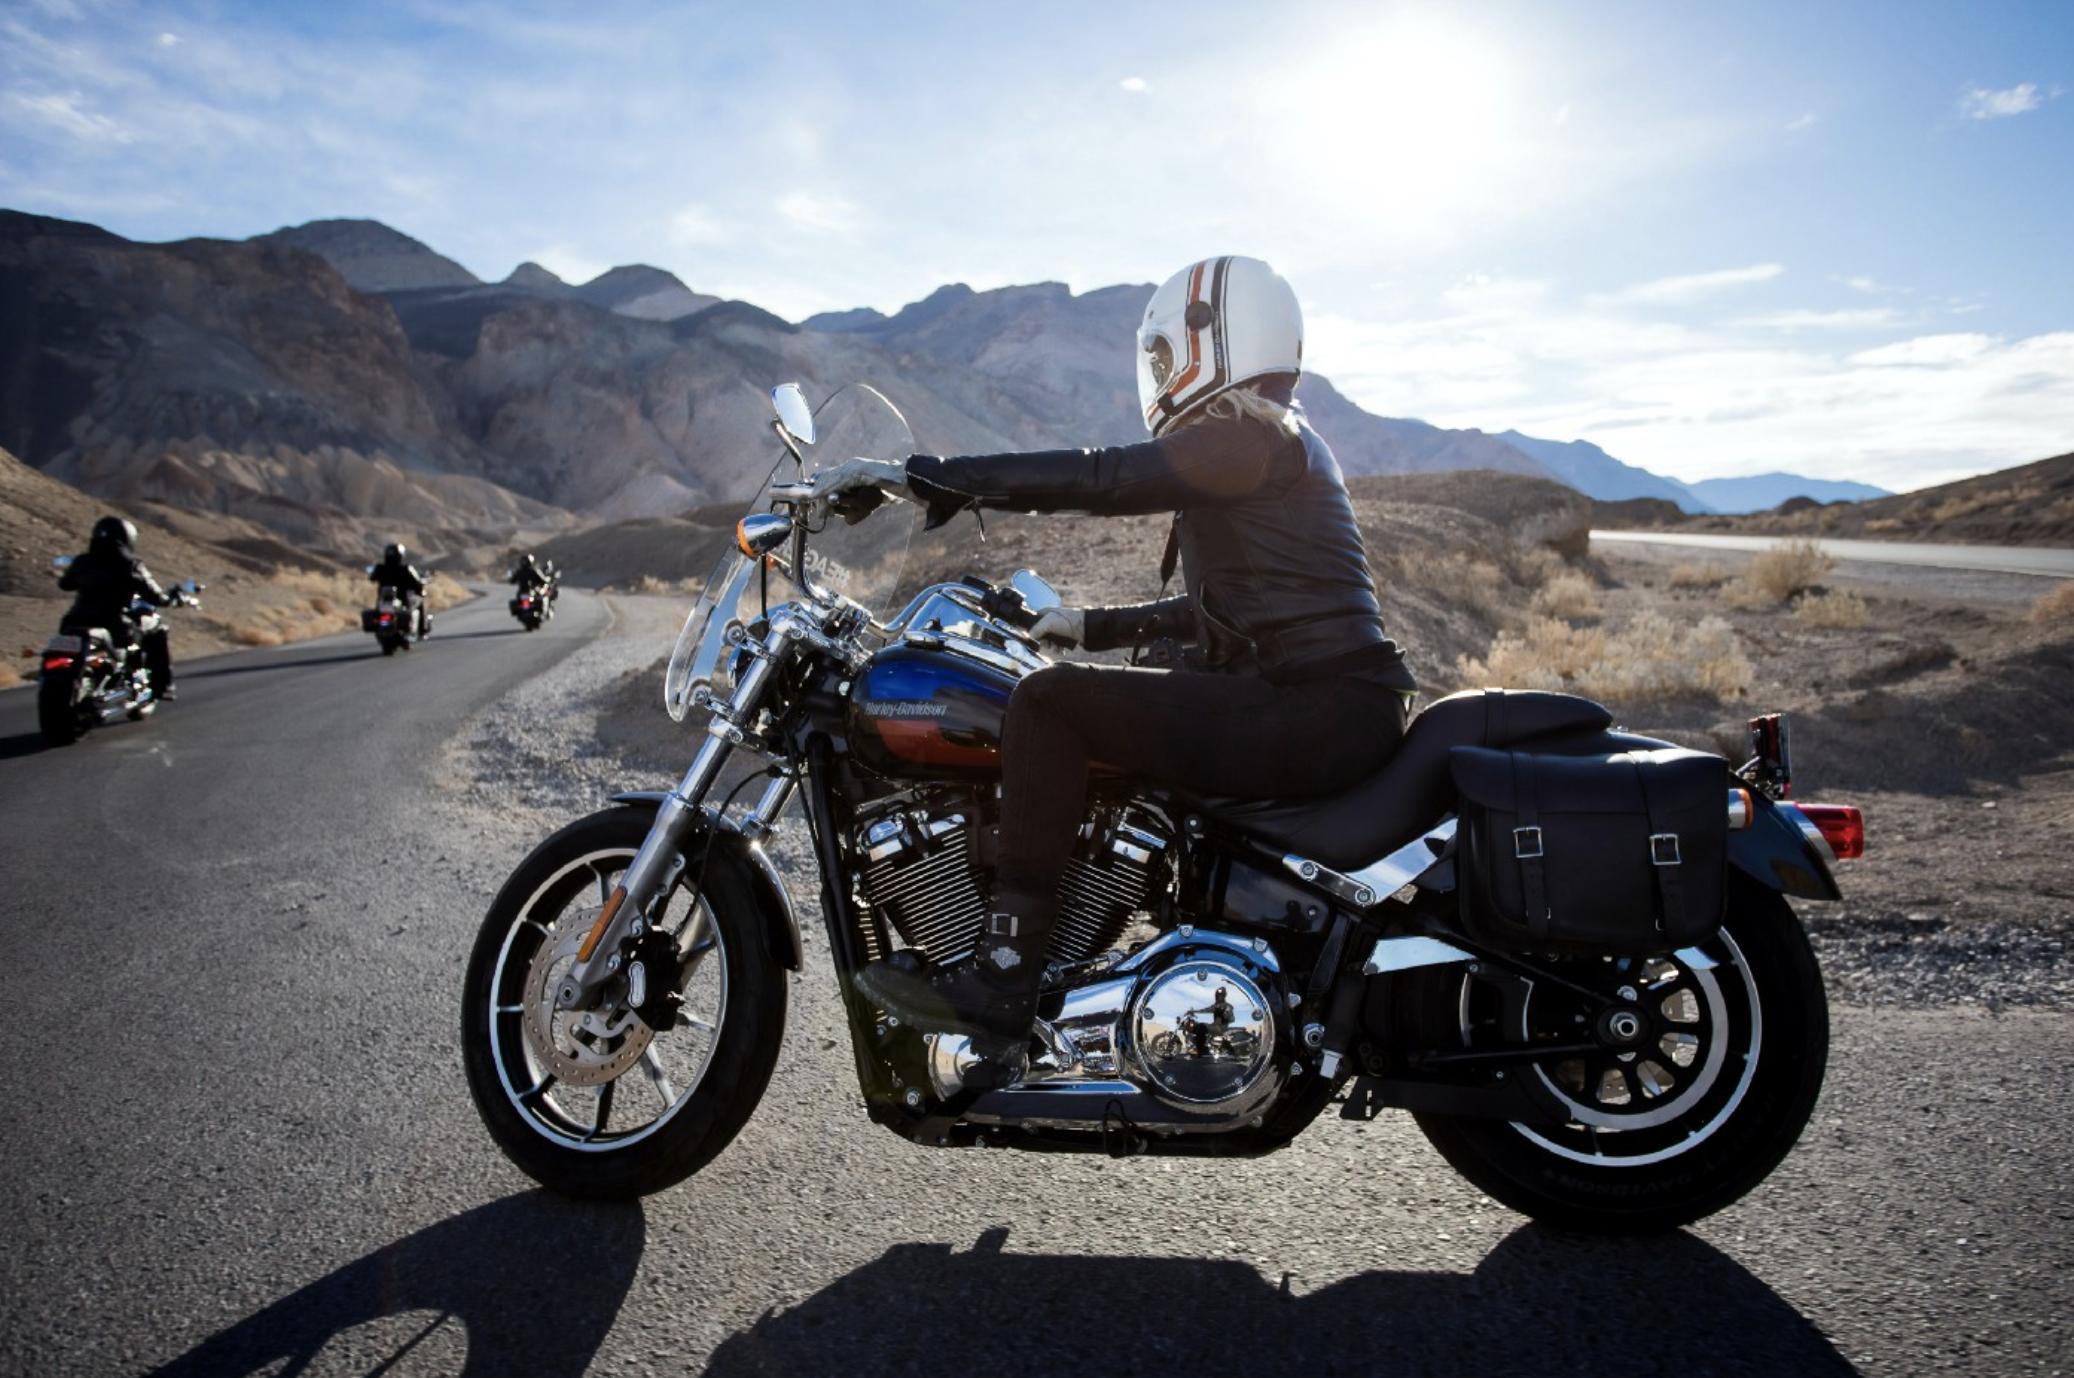 A man driving a Harley Davidson motor